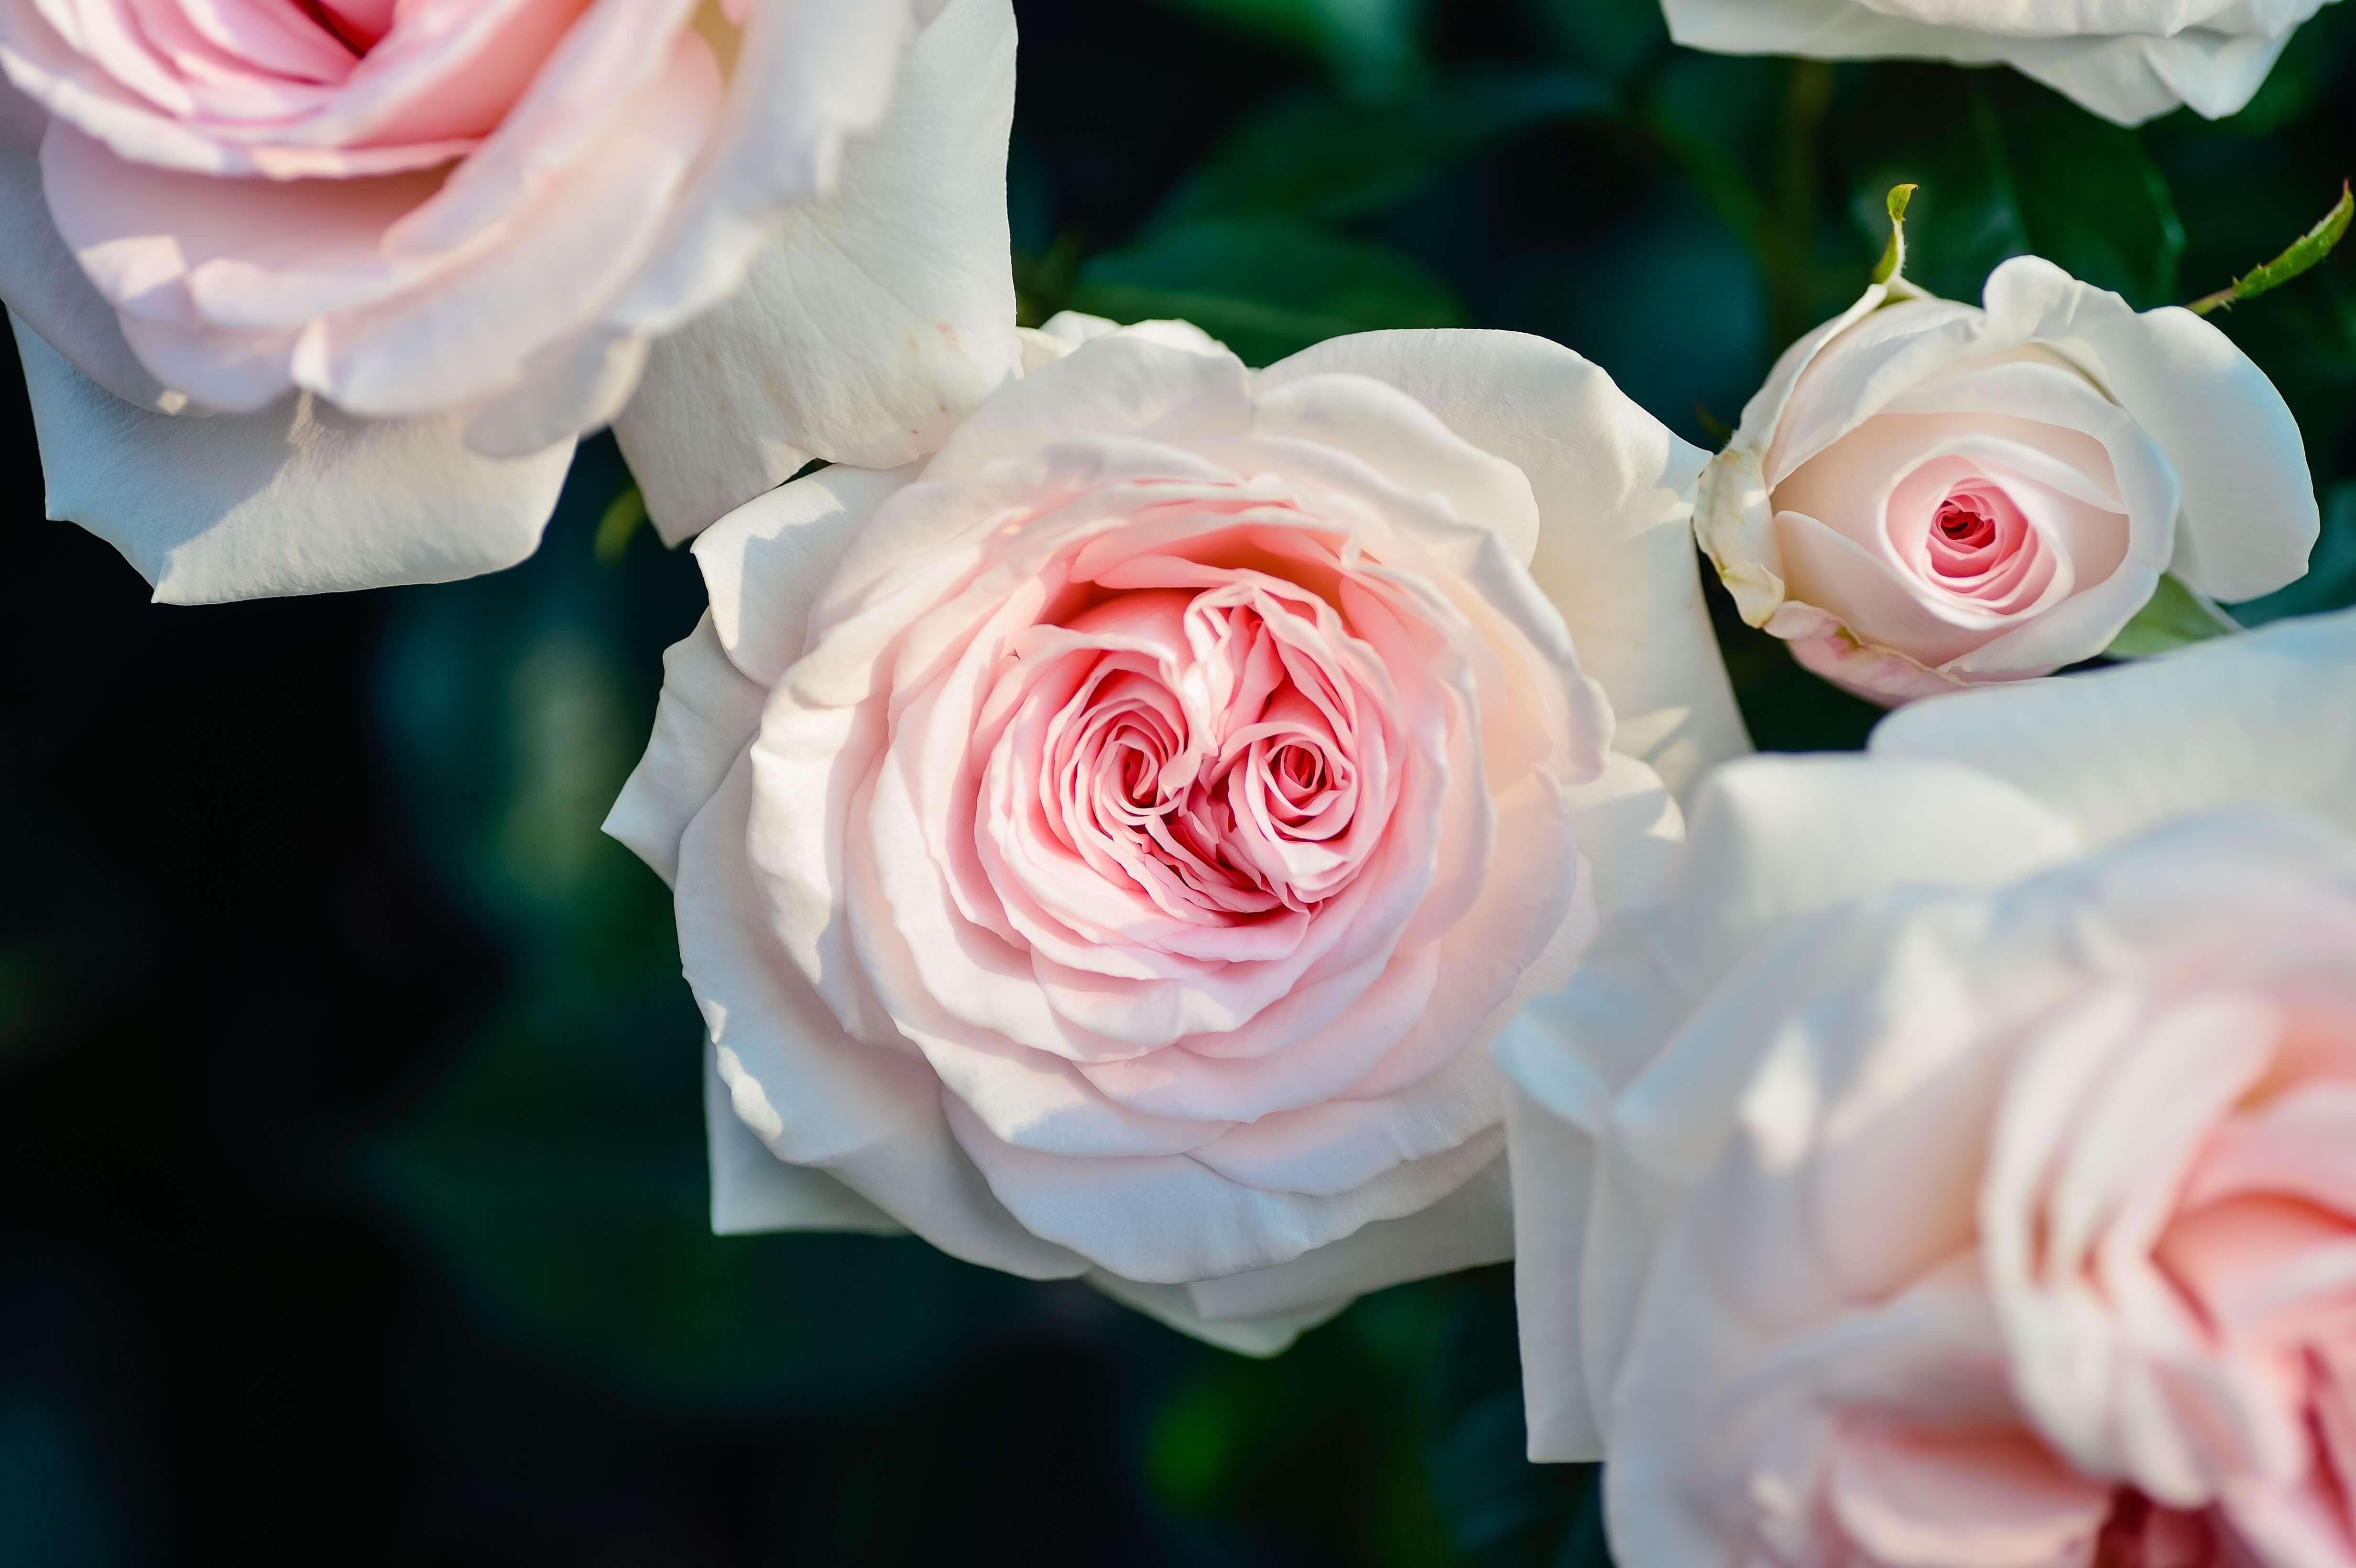 Rose favourite flower